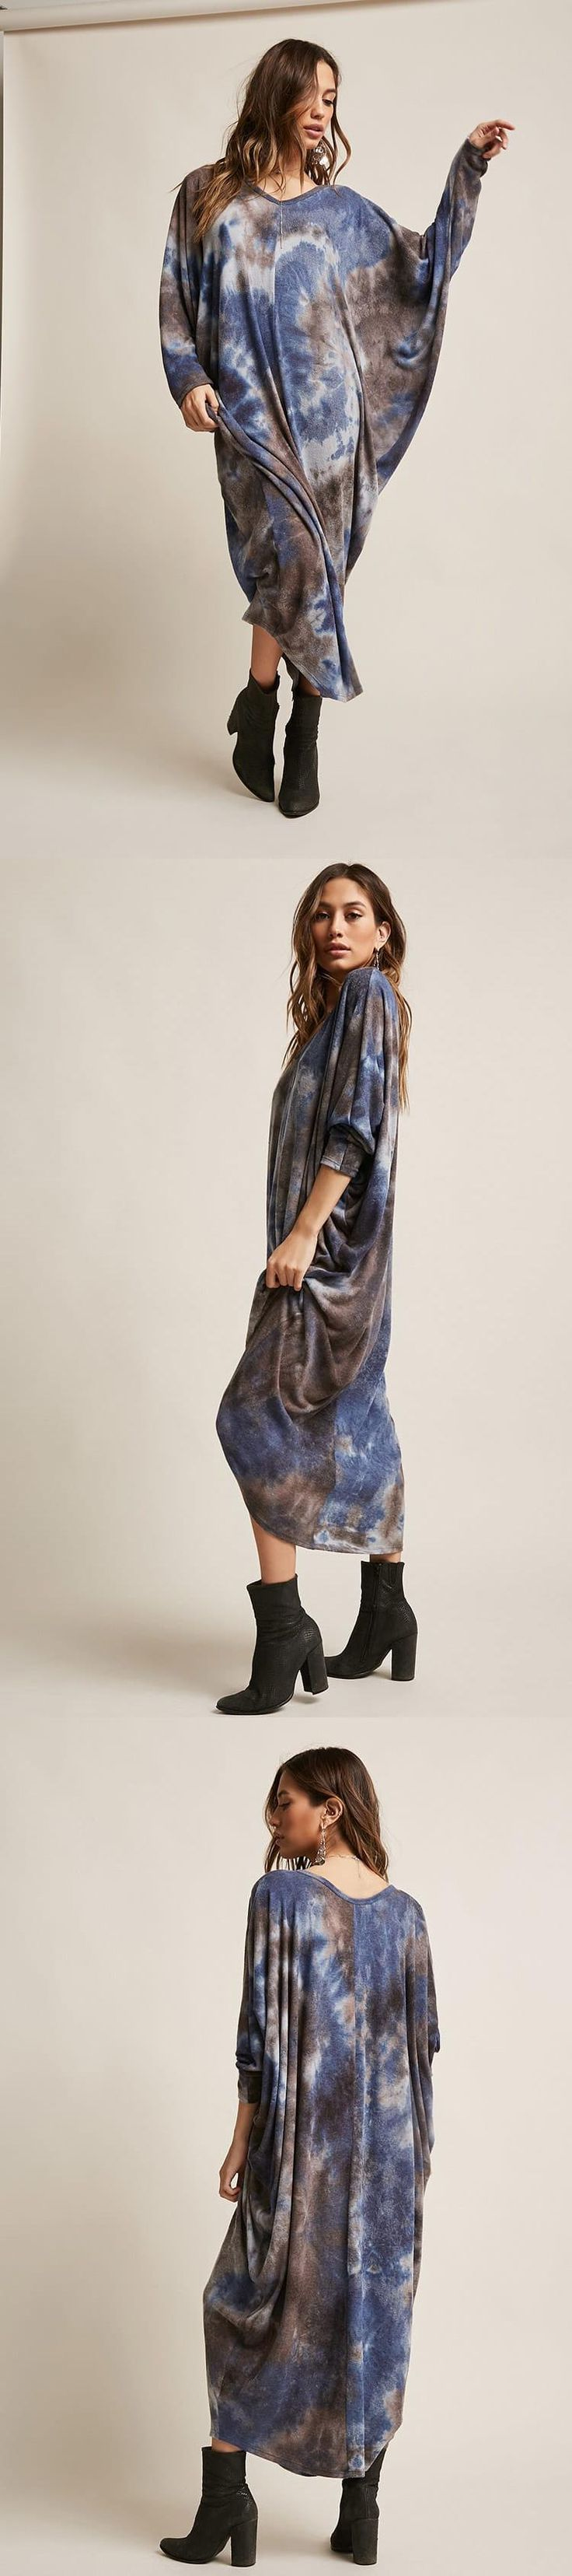 Oversized Tie-Dye Maxi Dress // 48.00 USD // Forever 21